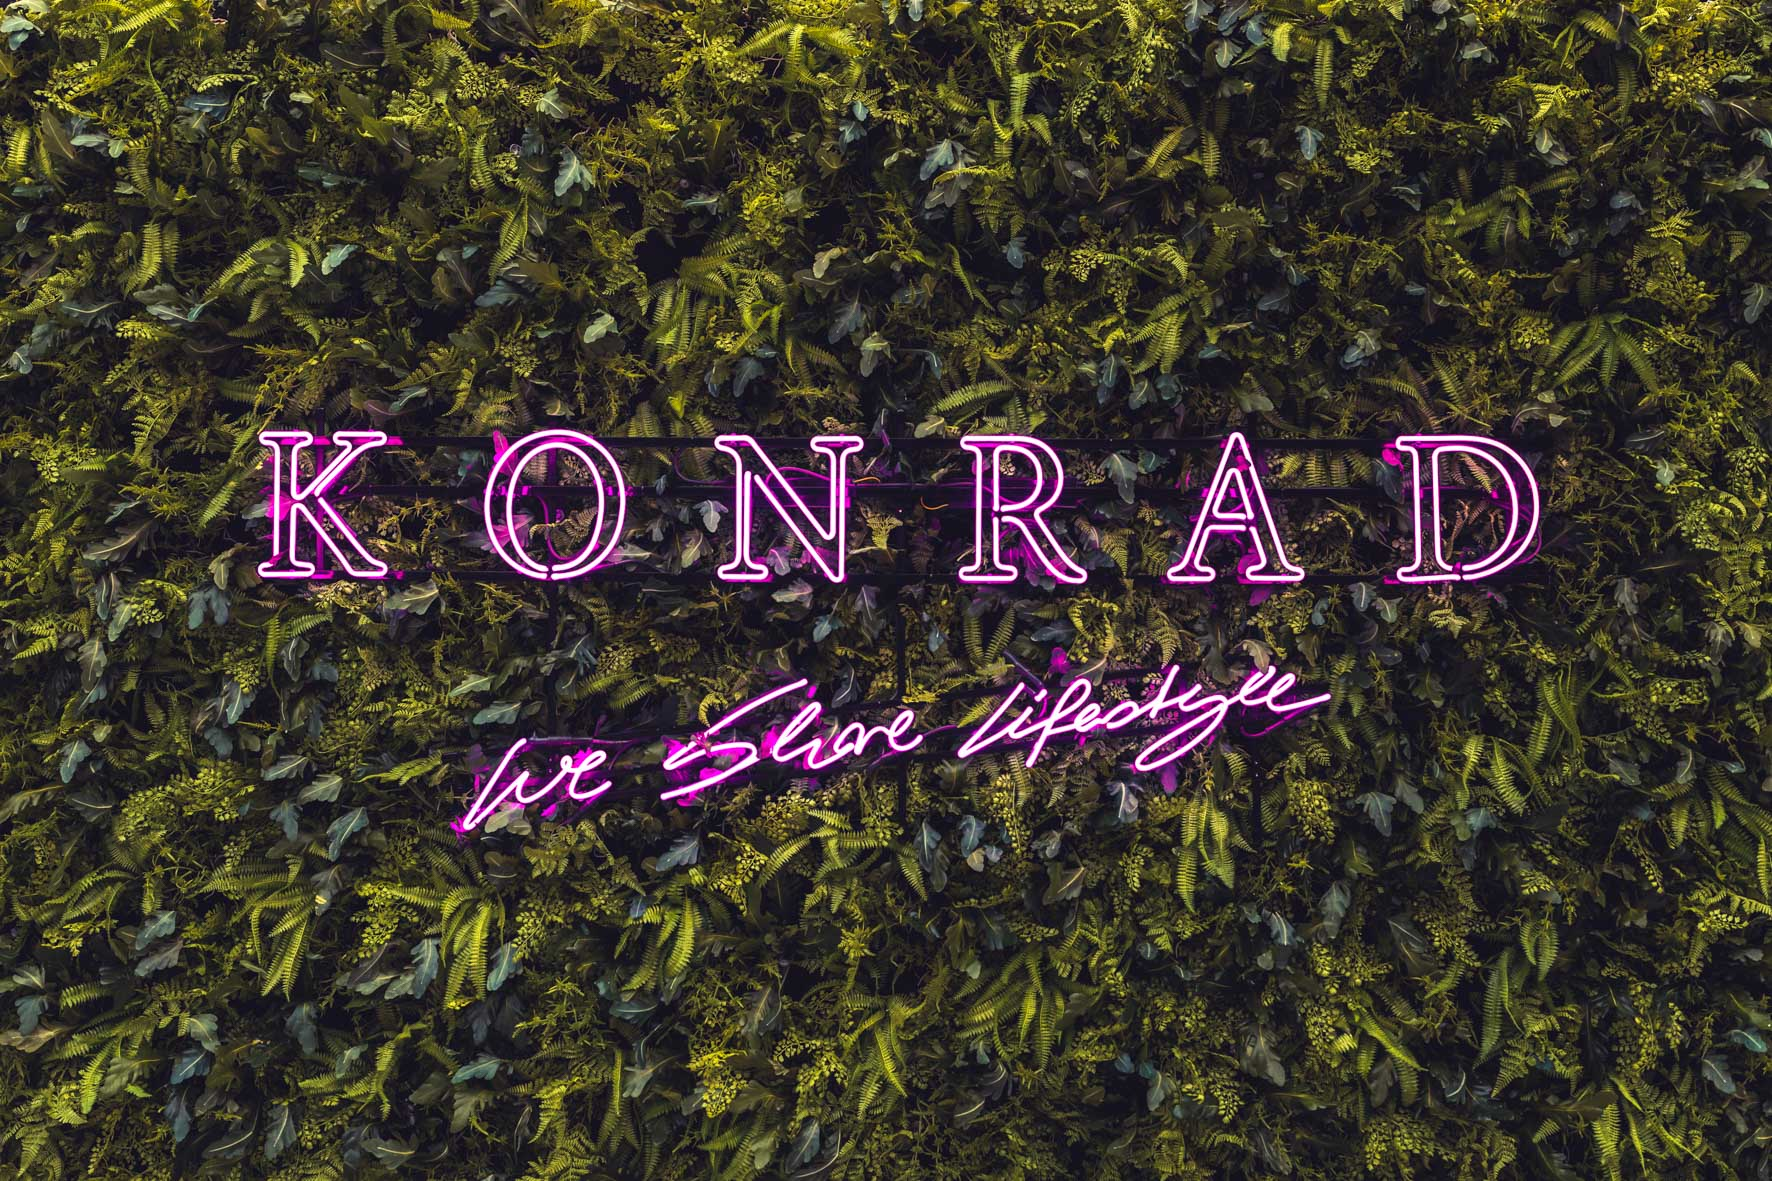 Konrad-lifestyle-art-basel-%22prestige%22-2019-1.jpg